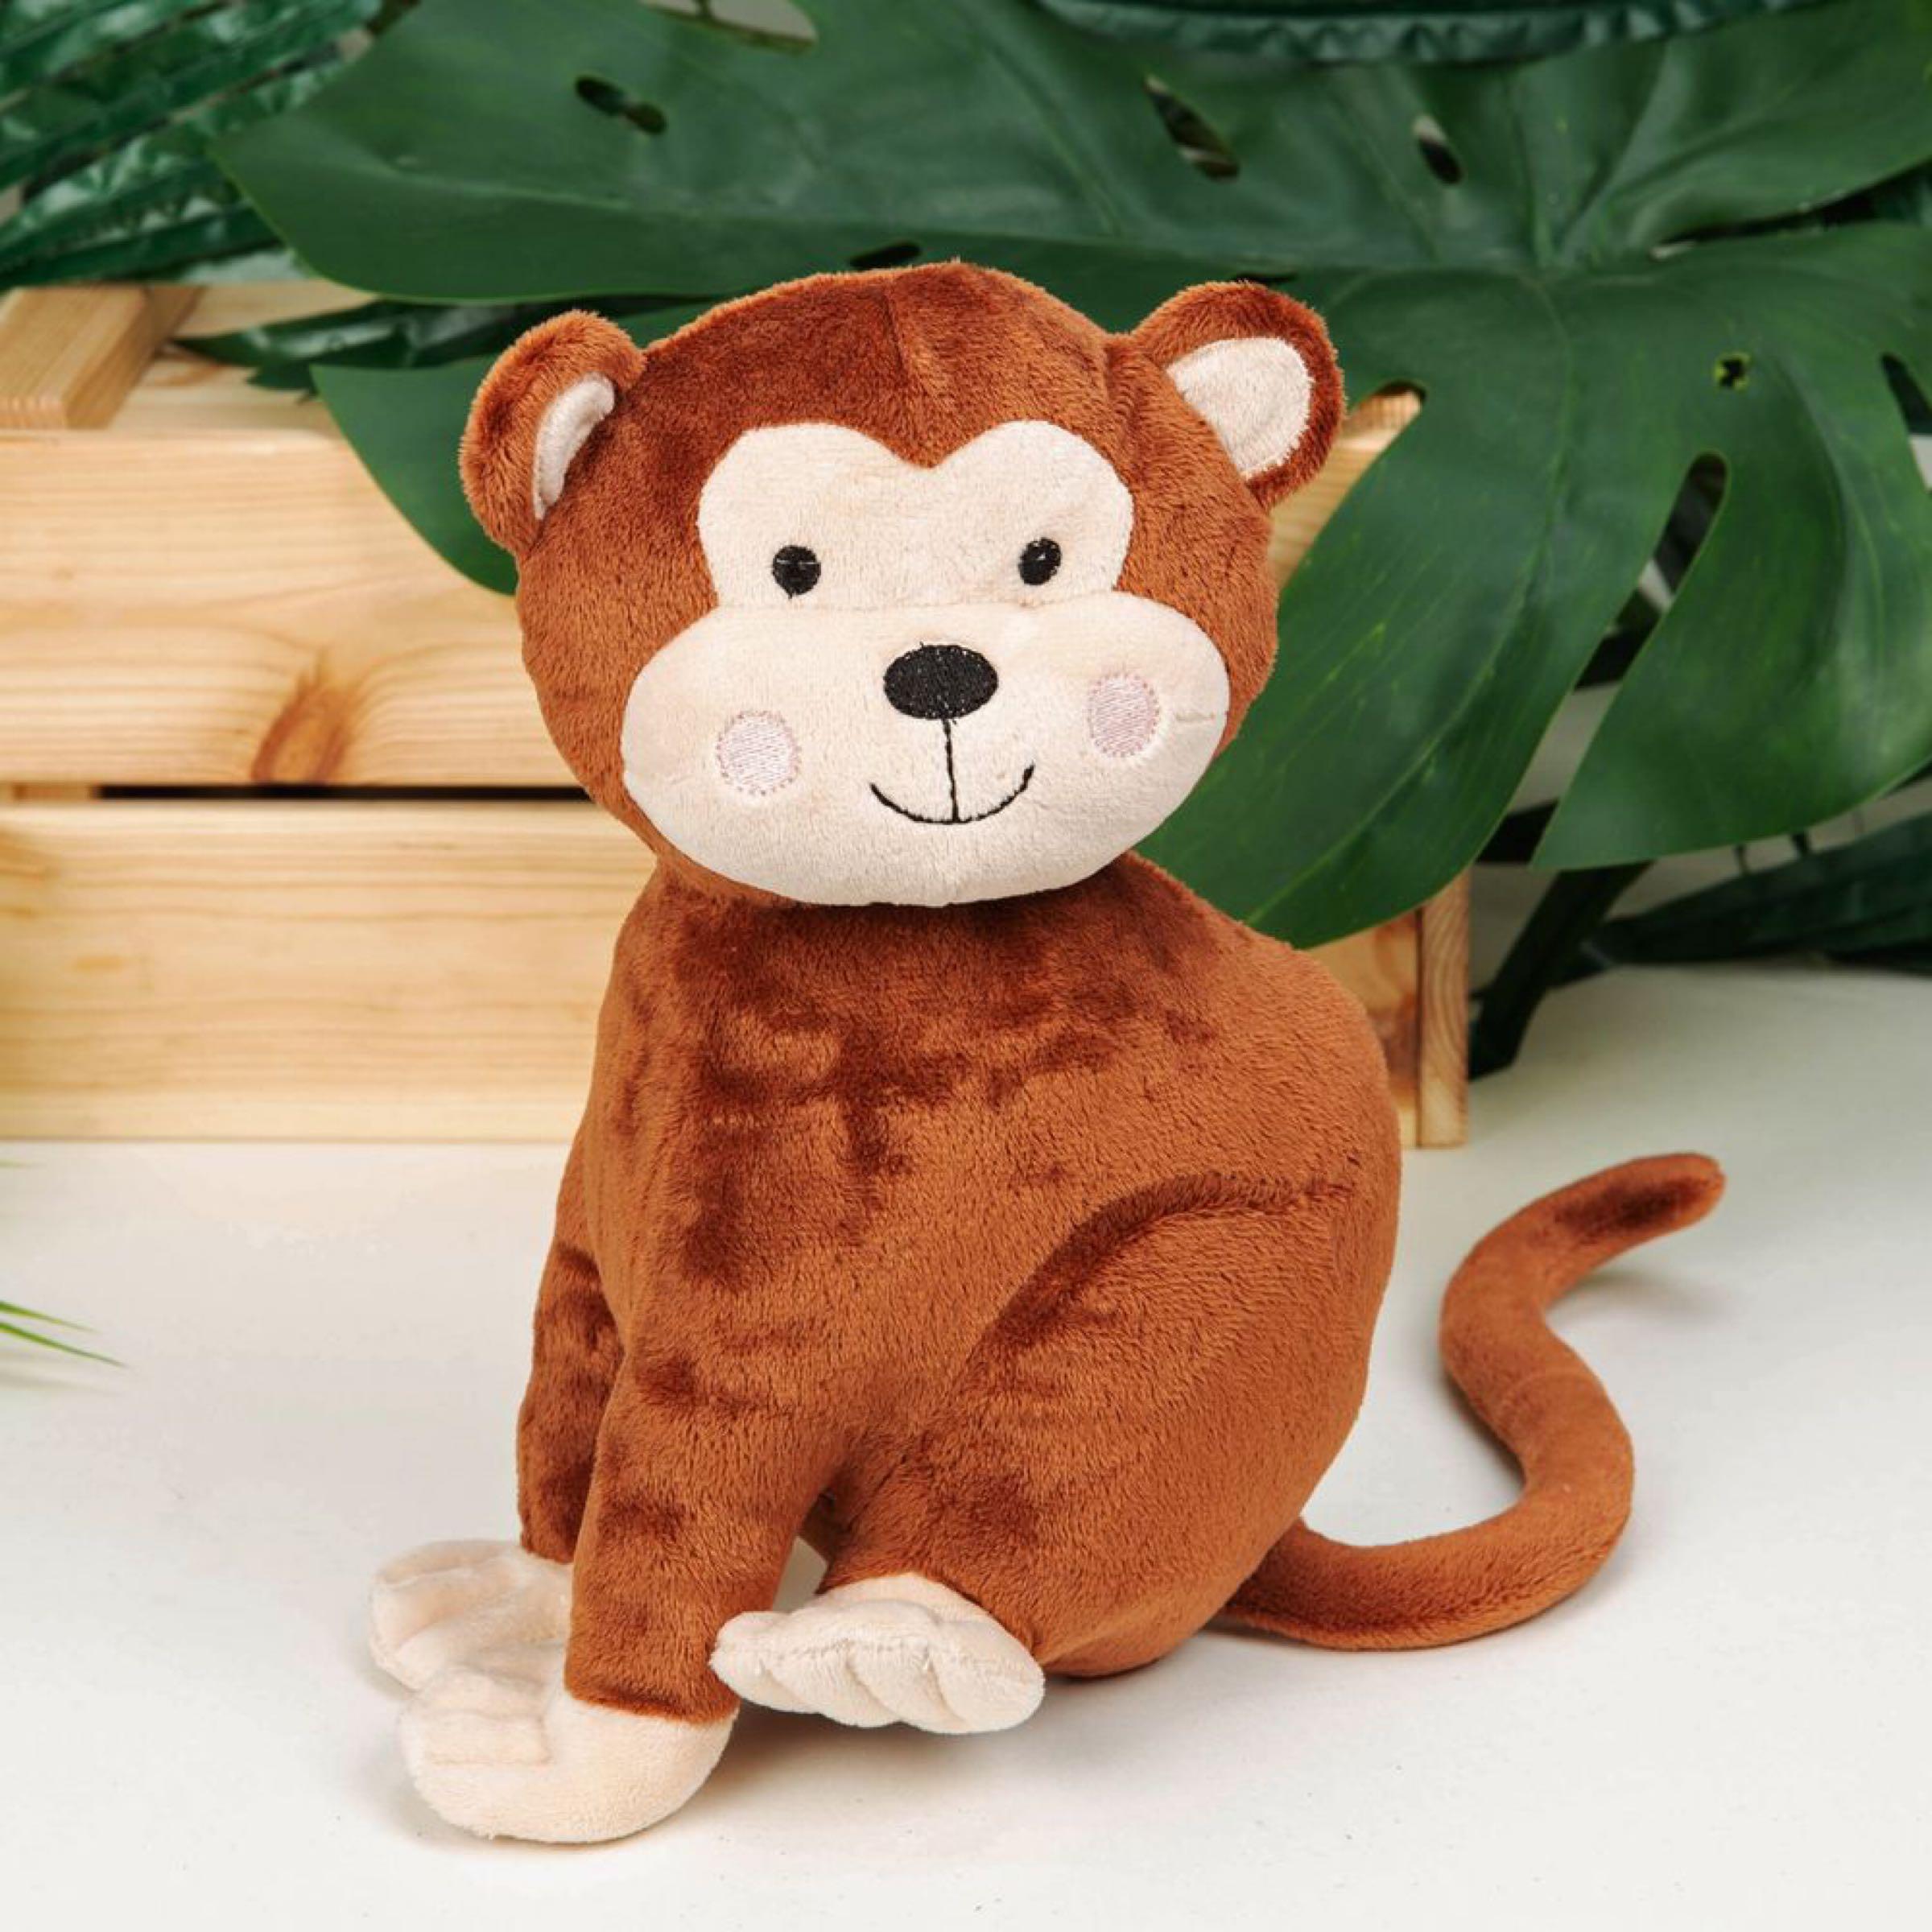 Jungle Baby Plush Monkey Toy 21cm